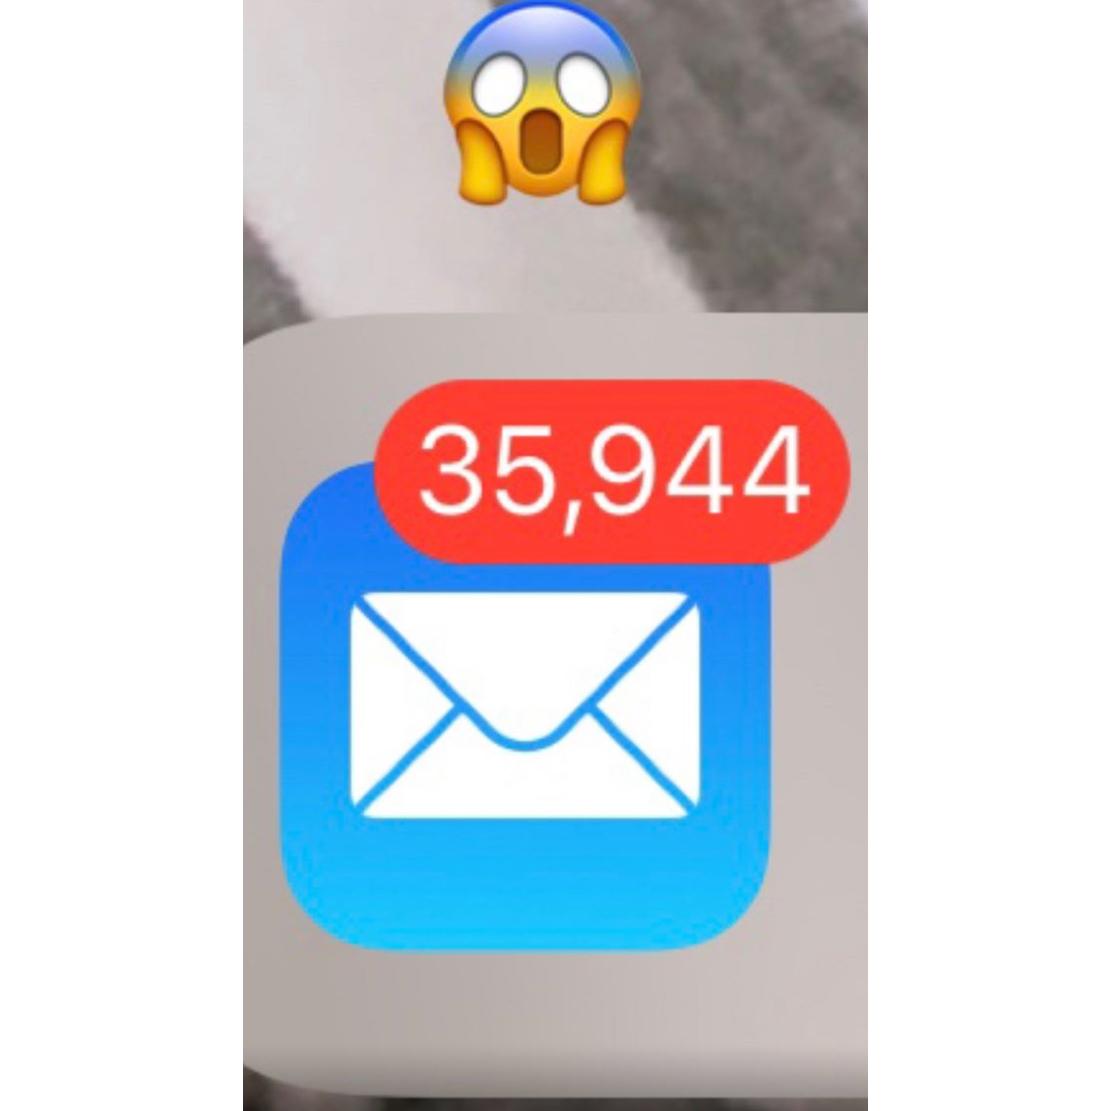 Chris Pratt Jack unread emails 2